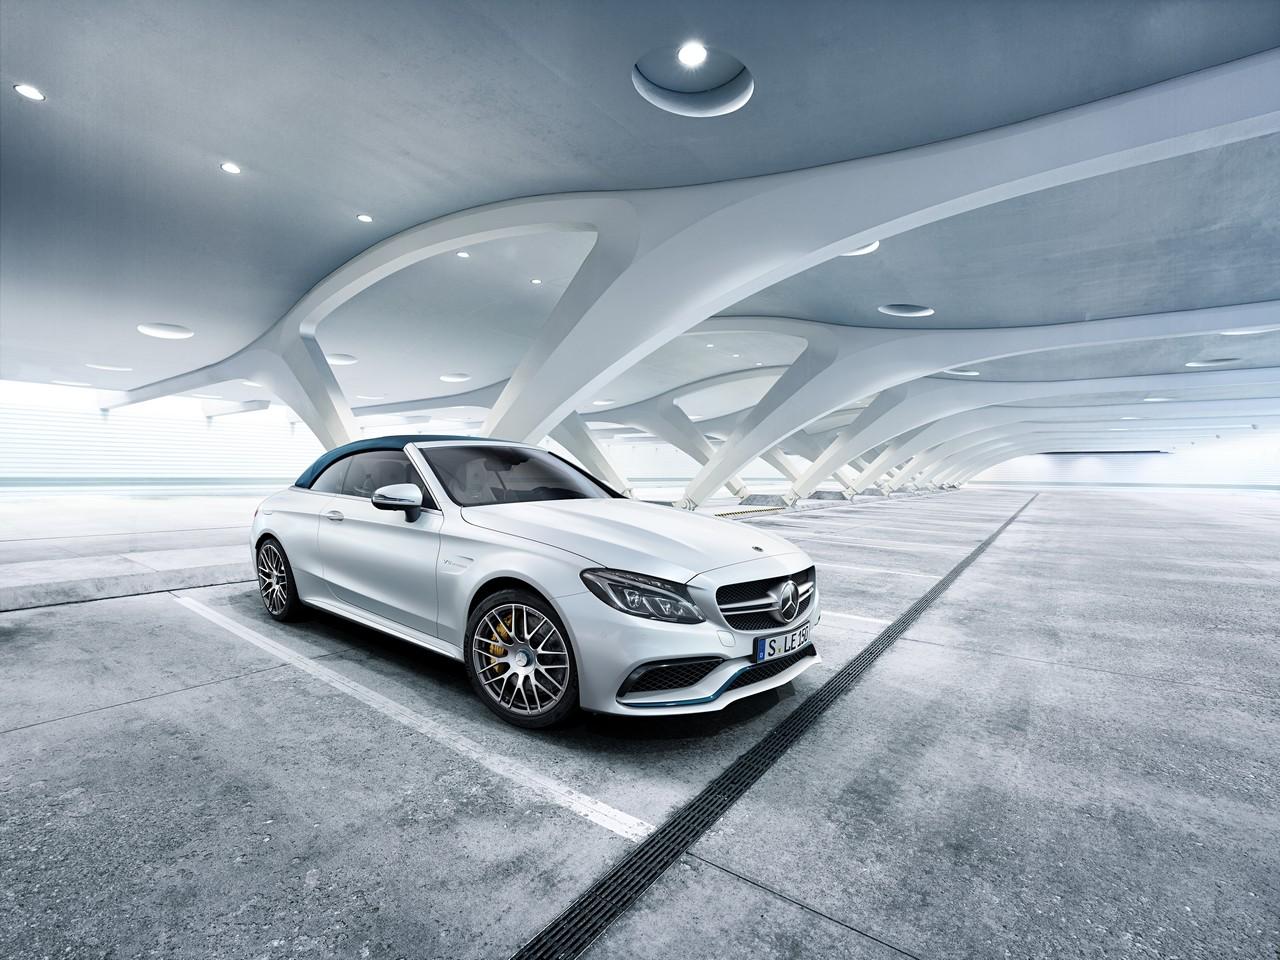 Mercedes-AMG C 63 Cabriolet Ocean Blue Edition